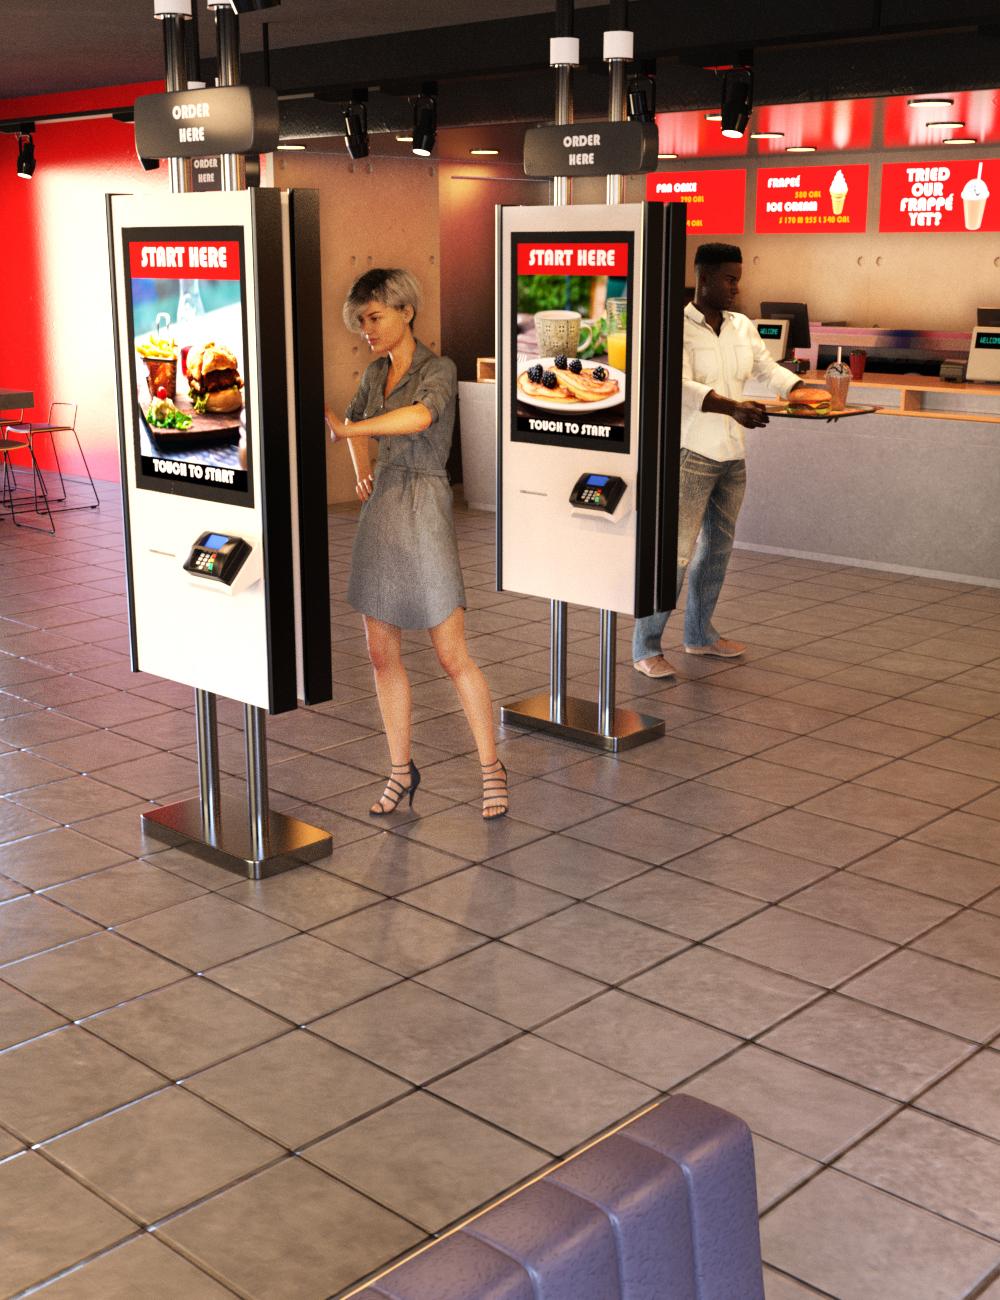 Burger Restaurant by: Charlie, 3D Models by Daz 3D